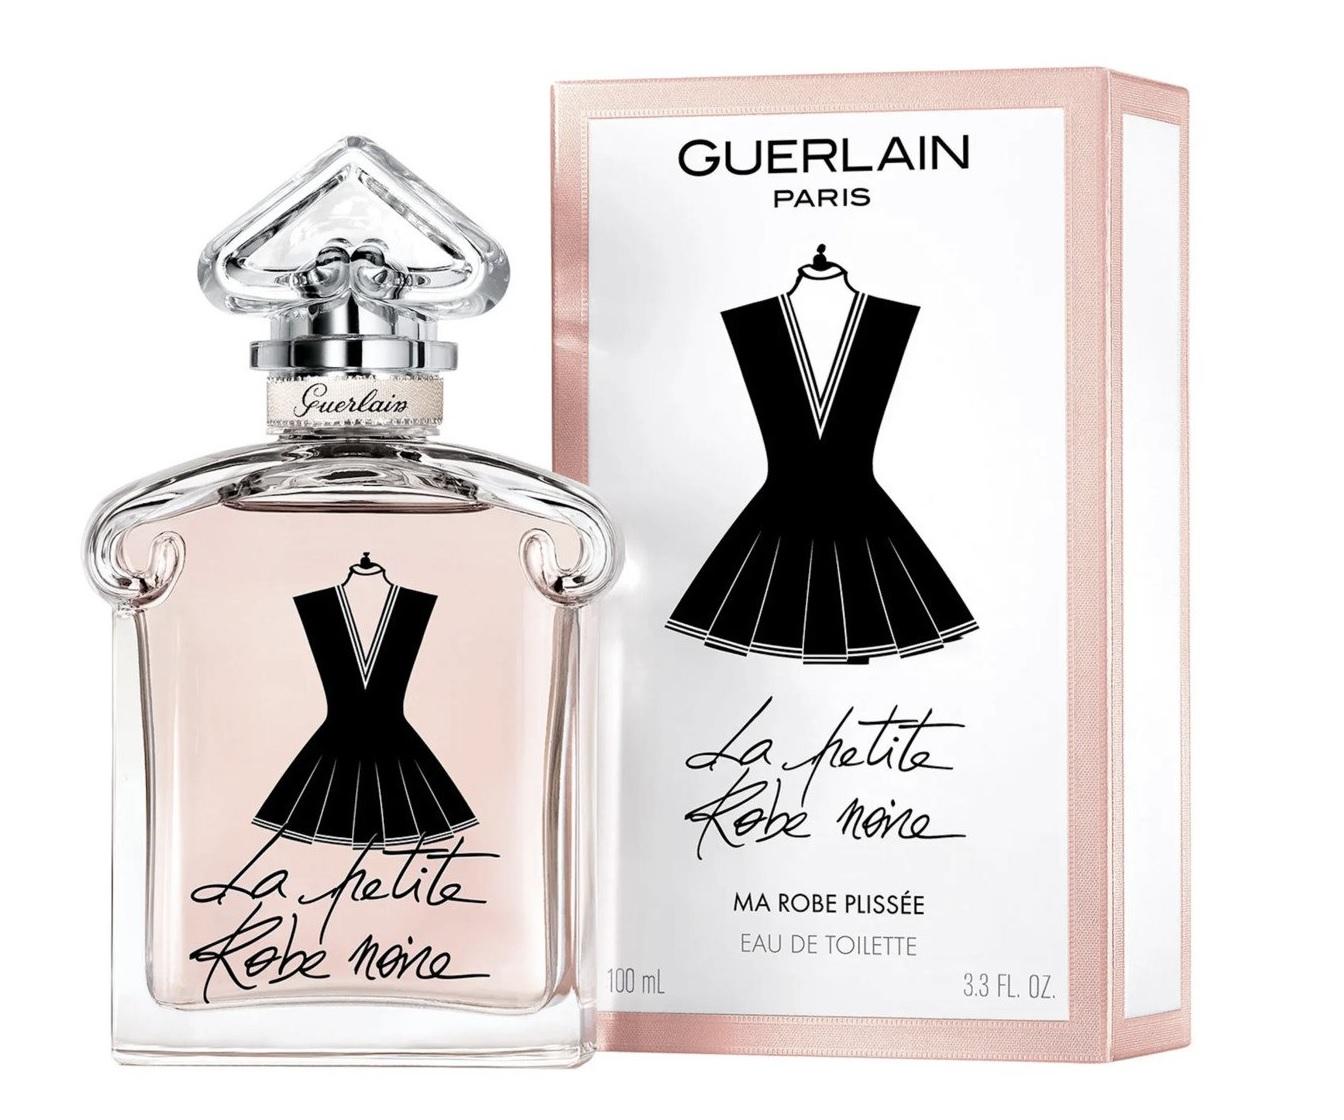 la petite robe noire pliss e guerlain perfume a new fragrance for women 2019. Black Bedroom Furniture Sets. Home Design Ideas